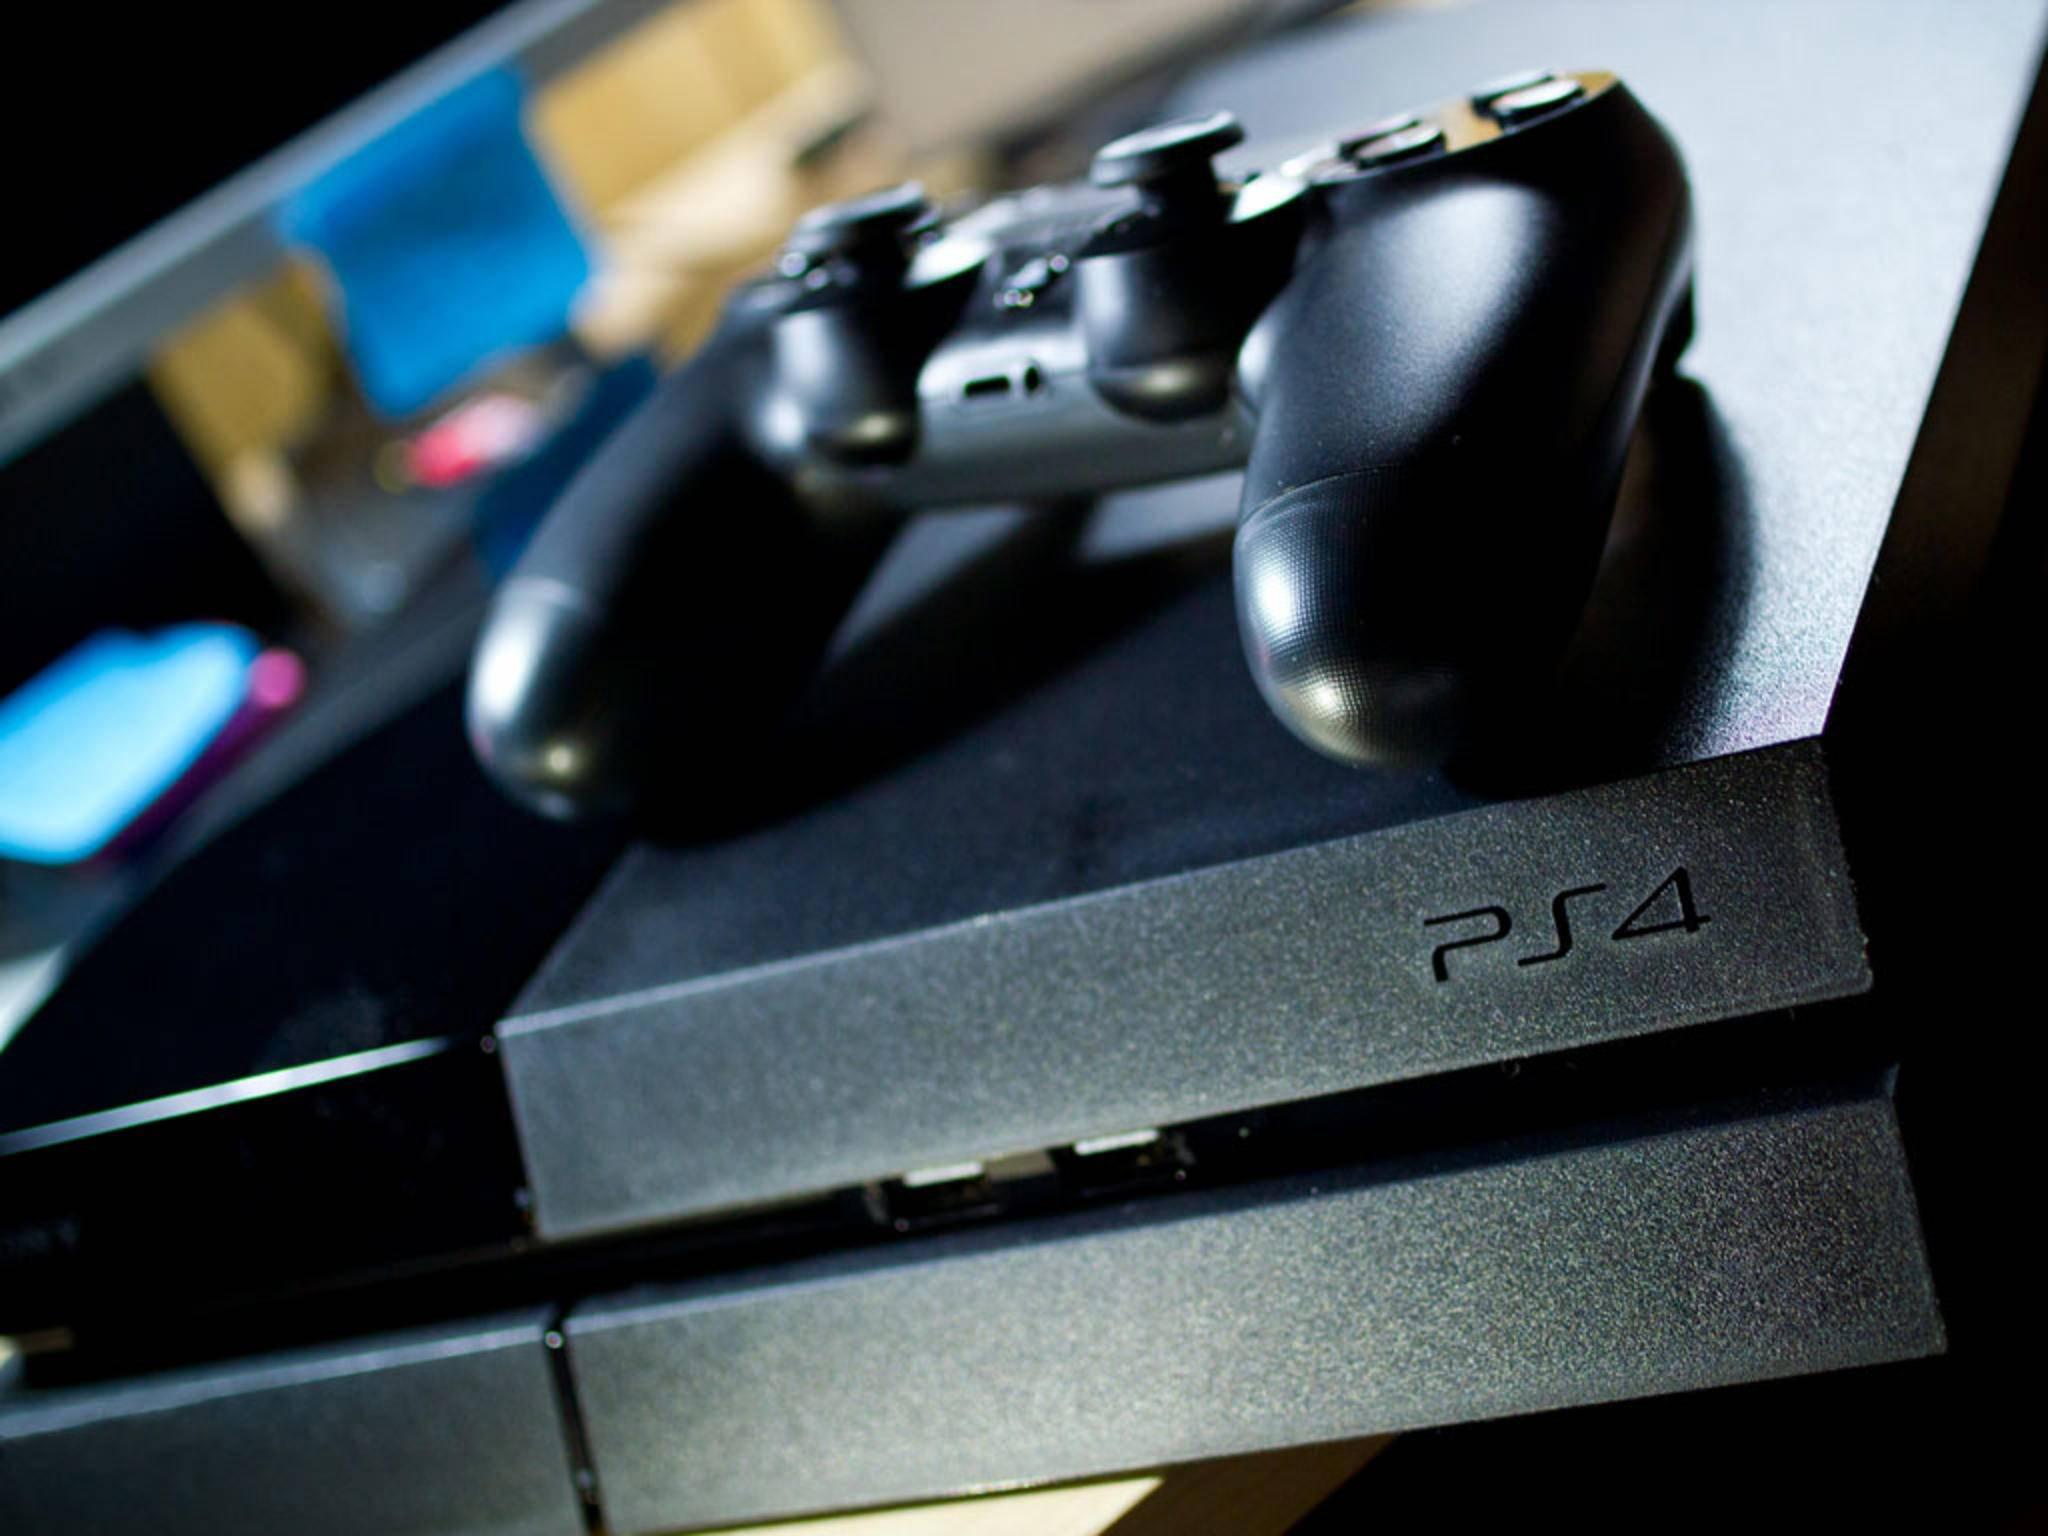 Die Playstation 4K nimmt immer konkretere Züge an.